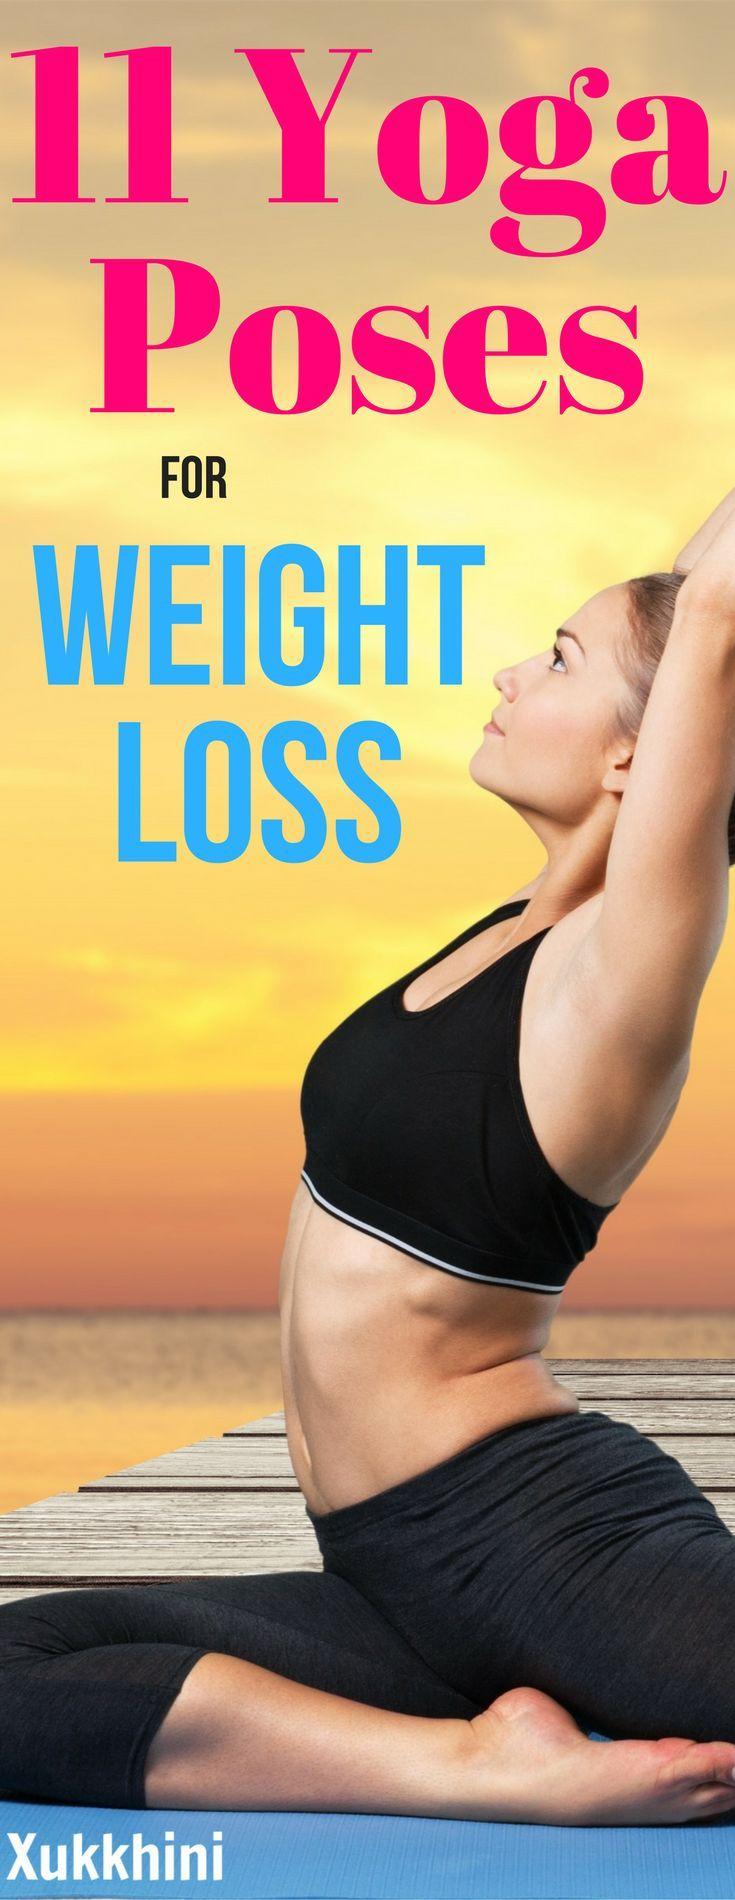 Diet plan post bariatric surgery